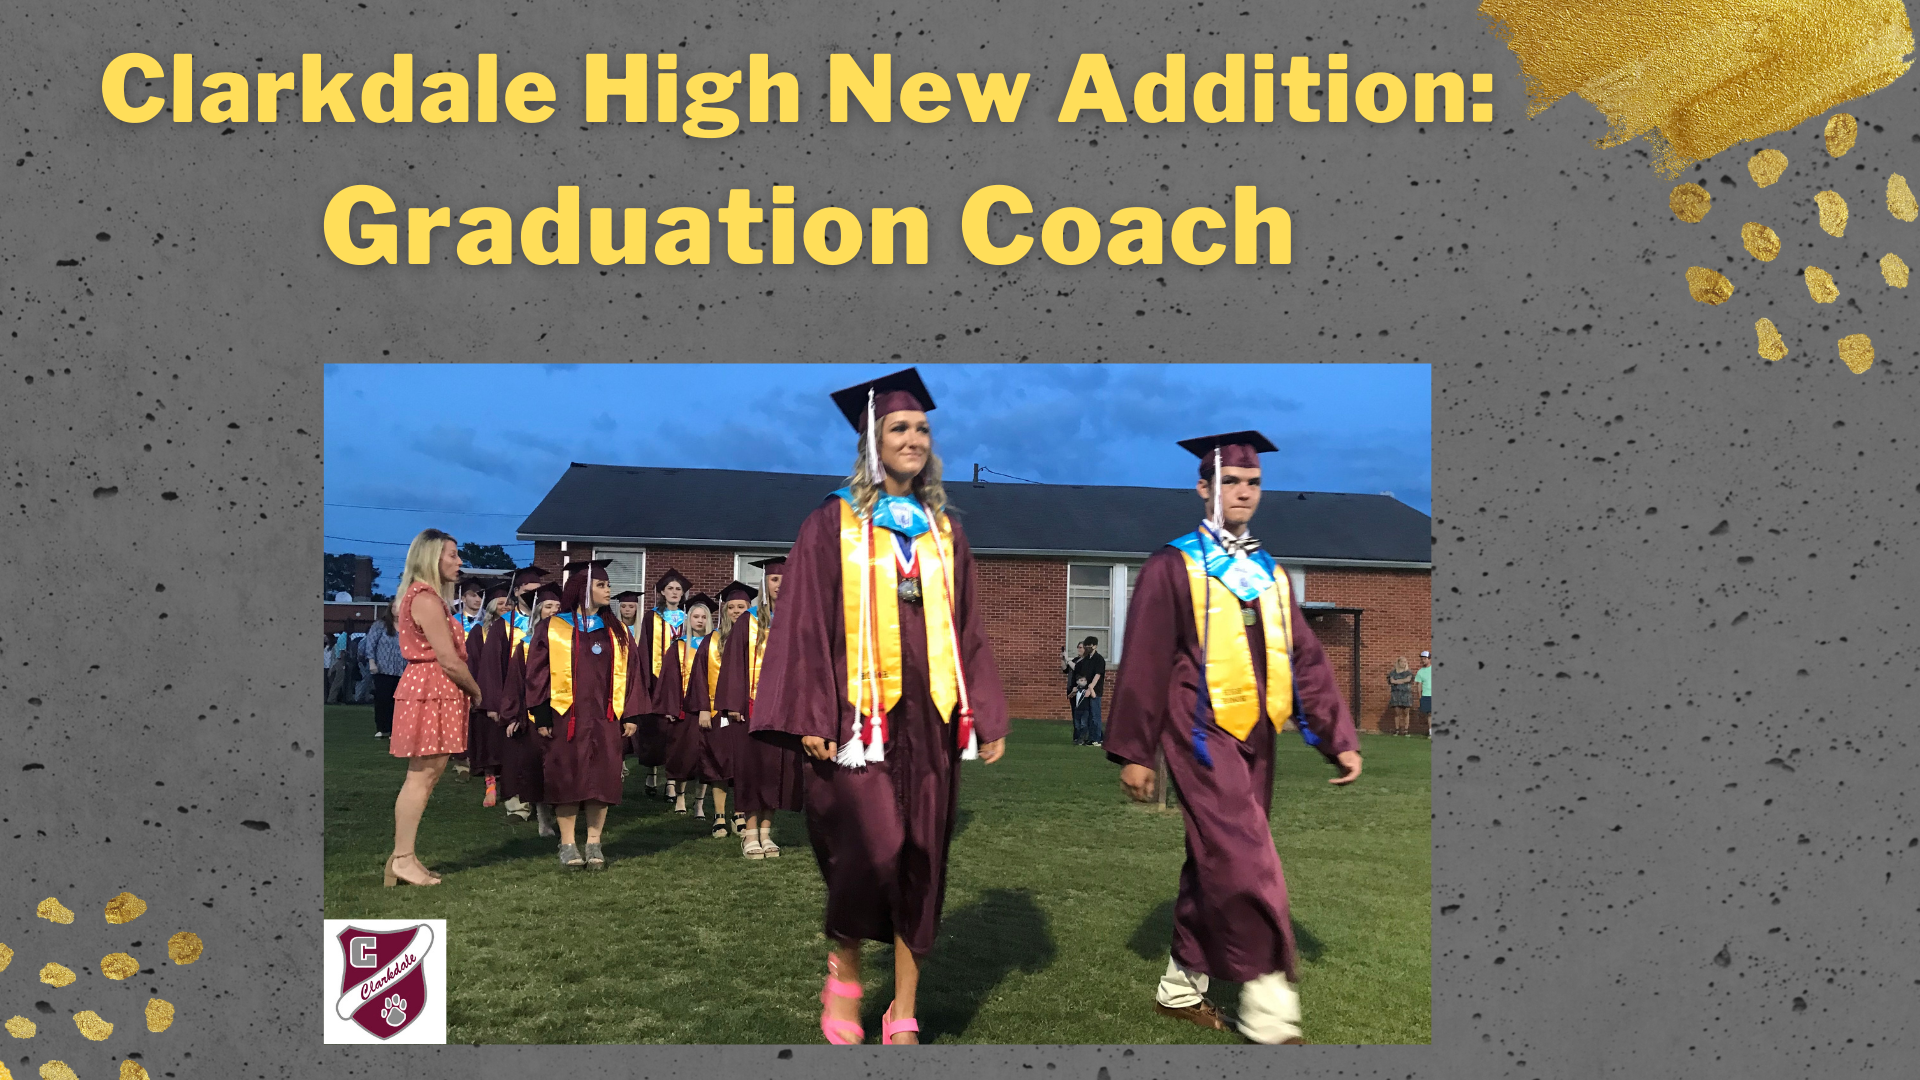 CHS New Graduation Coach